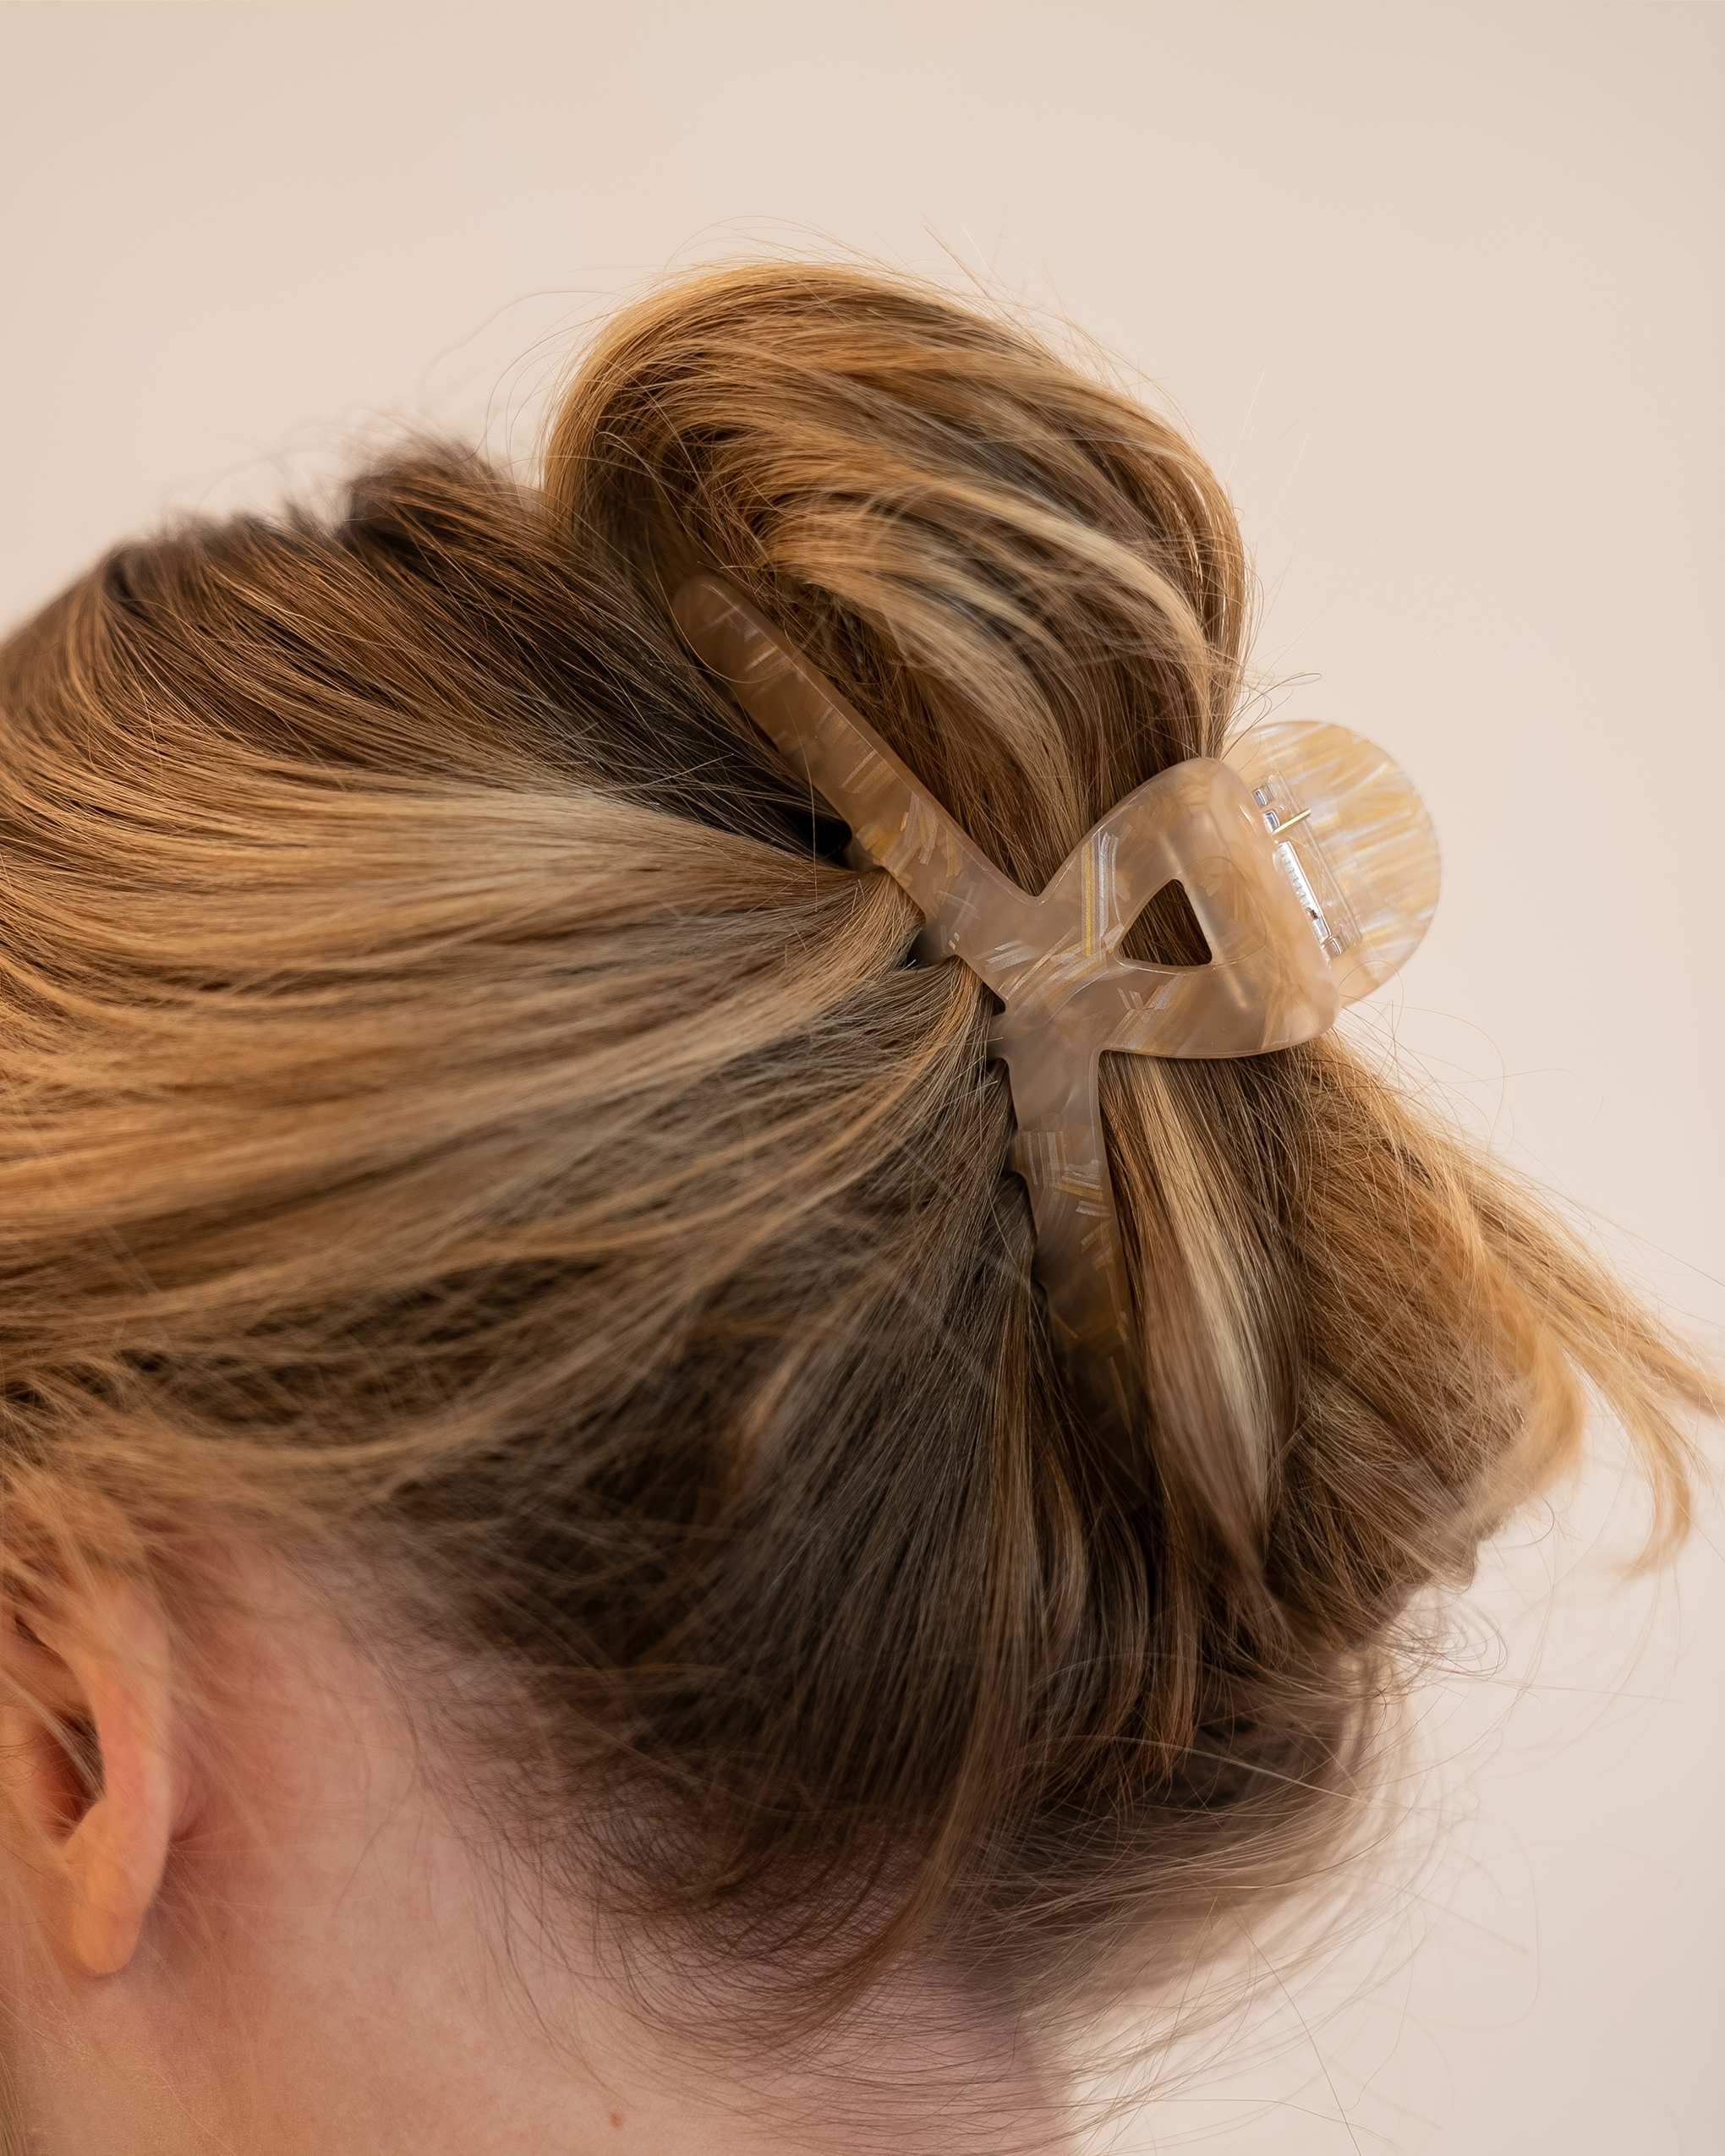 Model wearing Emin + Paul buttermilk angular hair claw.